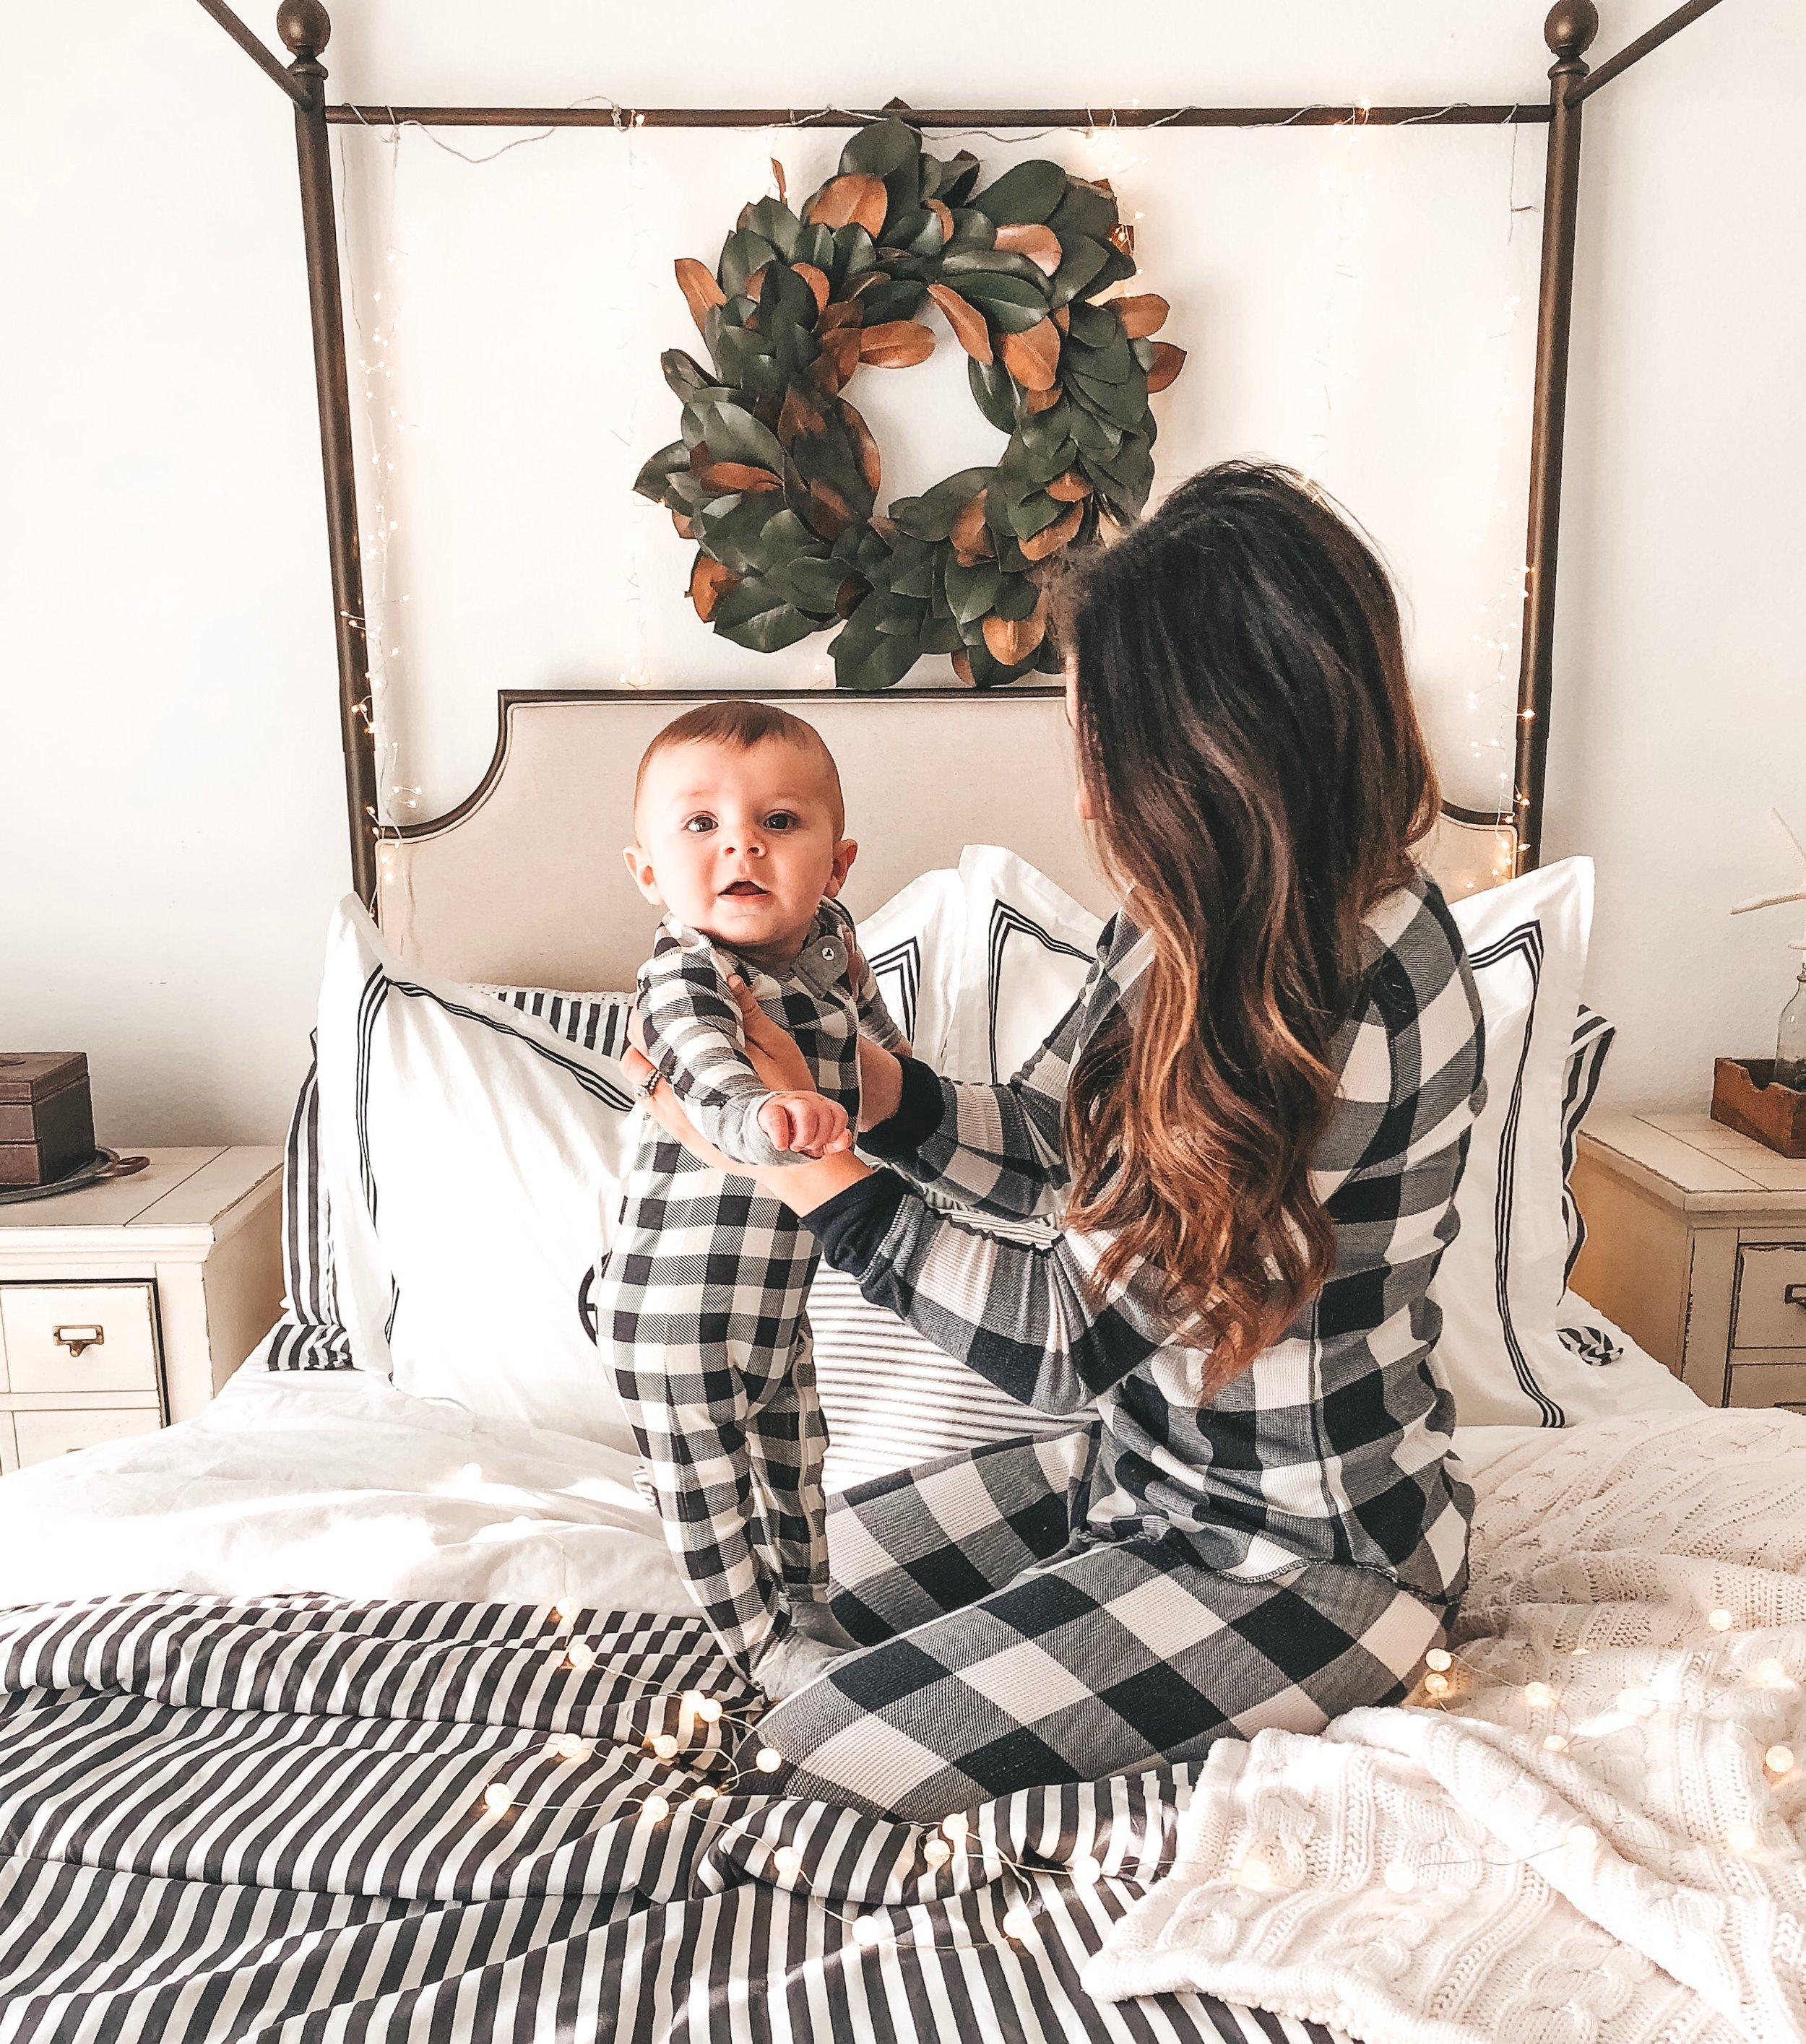 Mommy and baby matching Christmas pajamas.